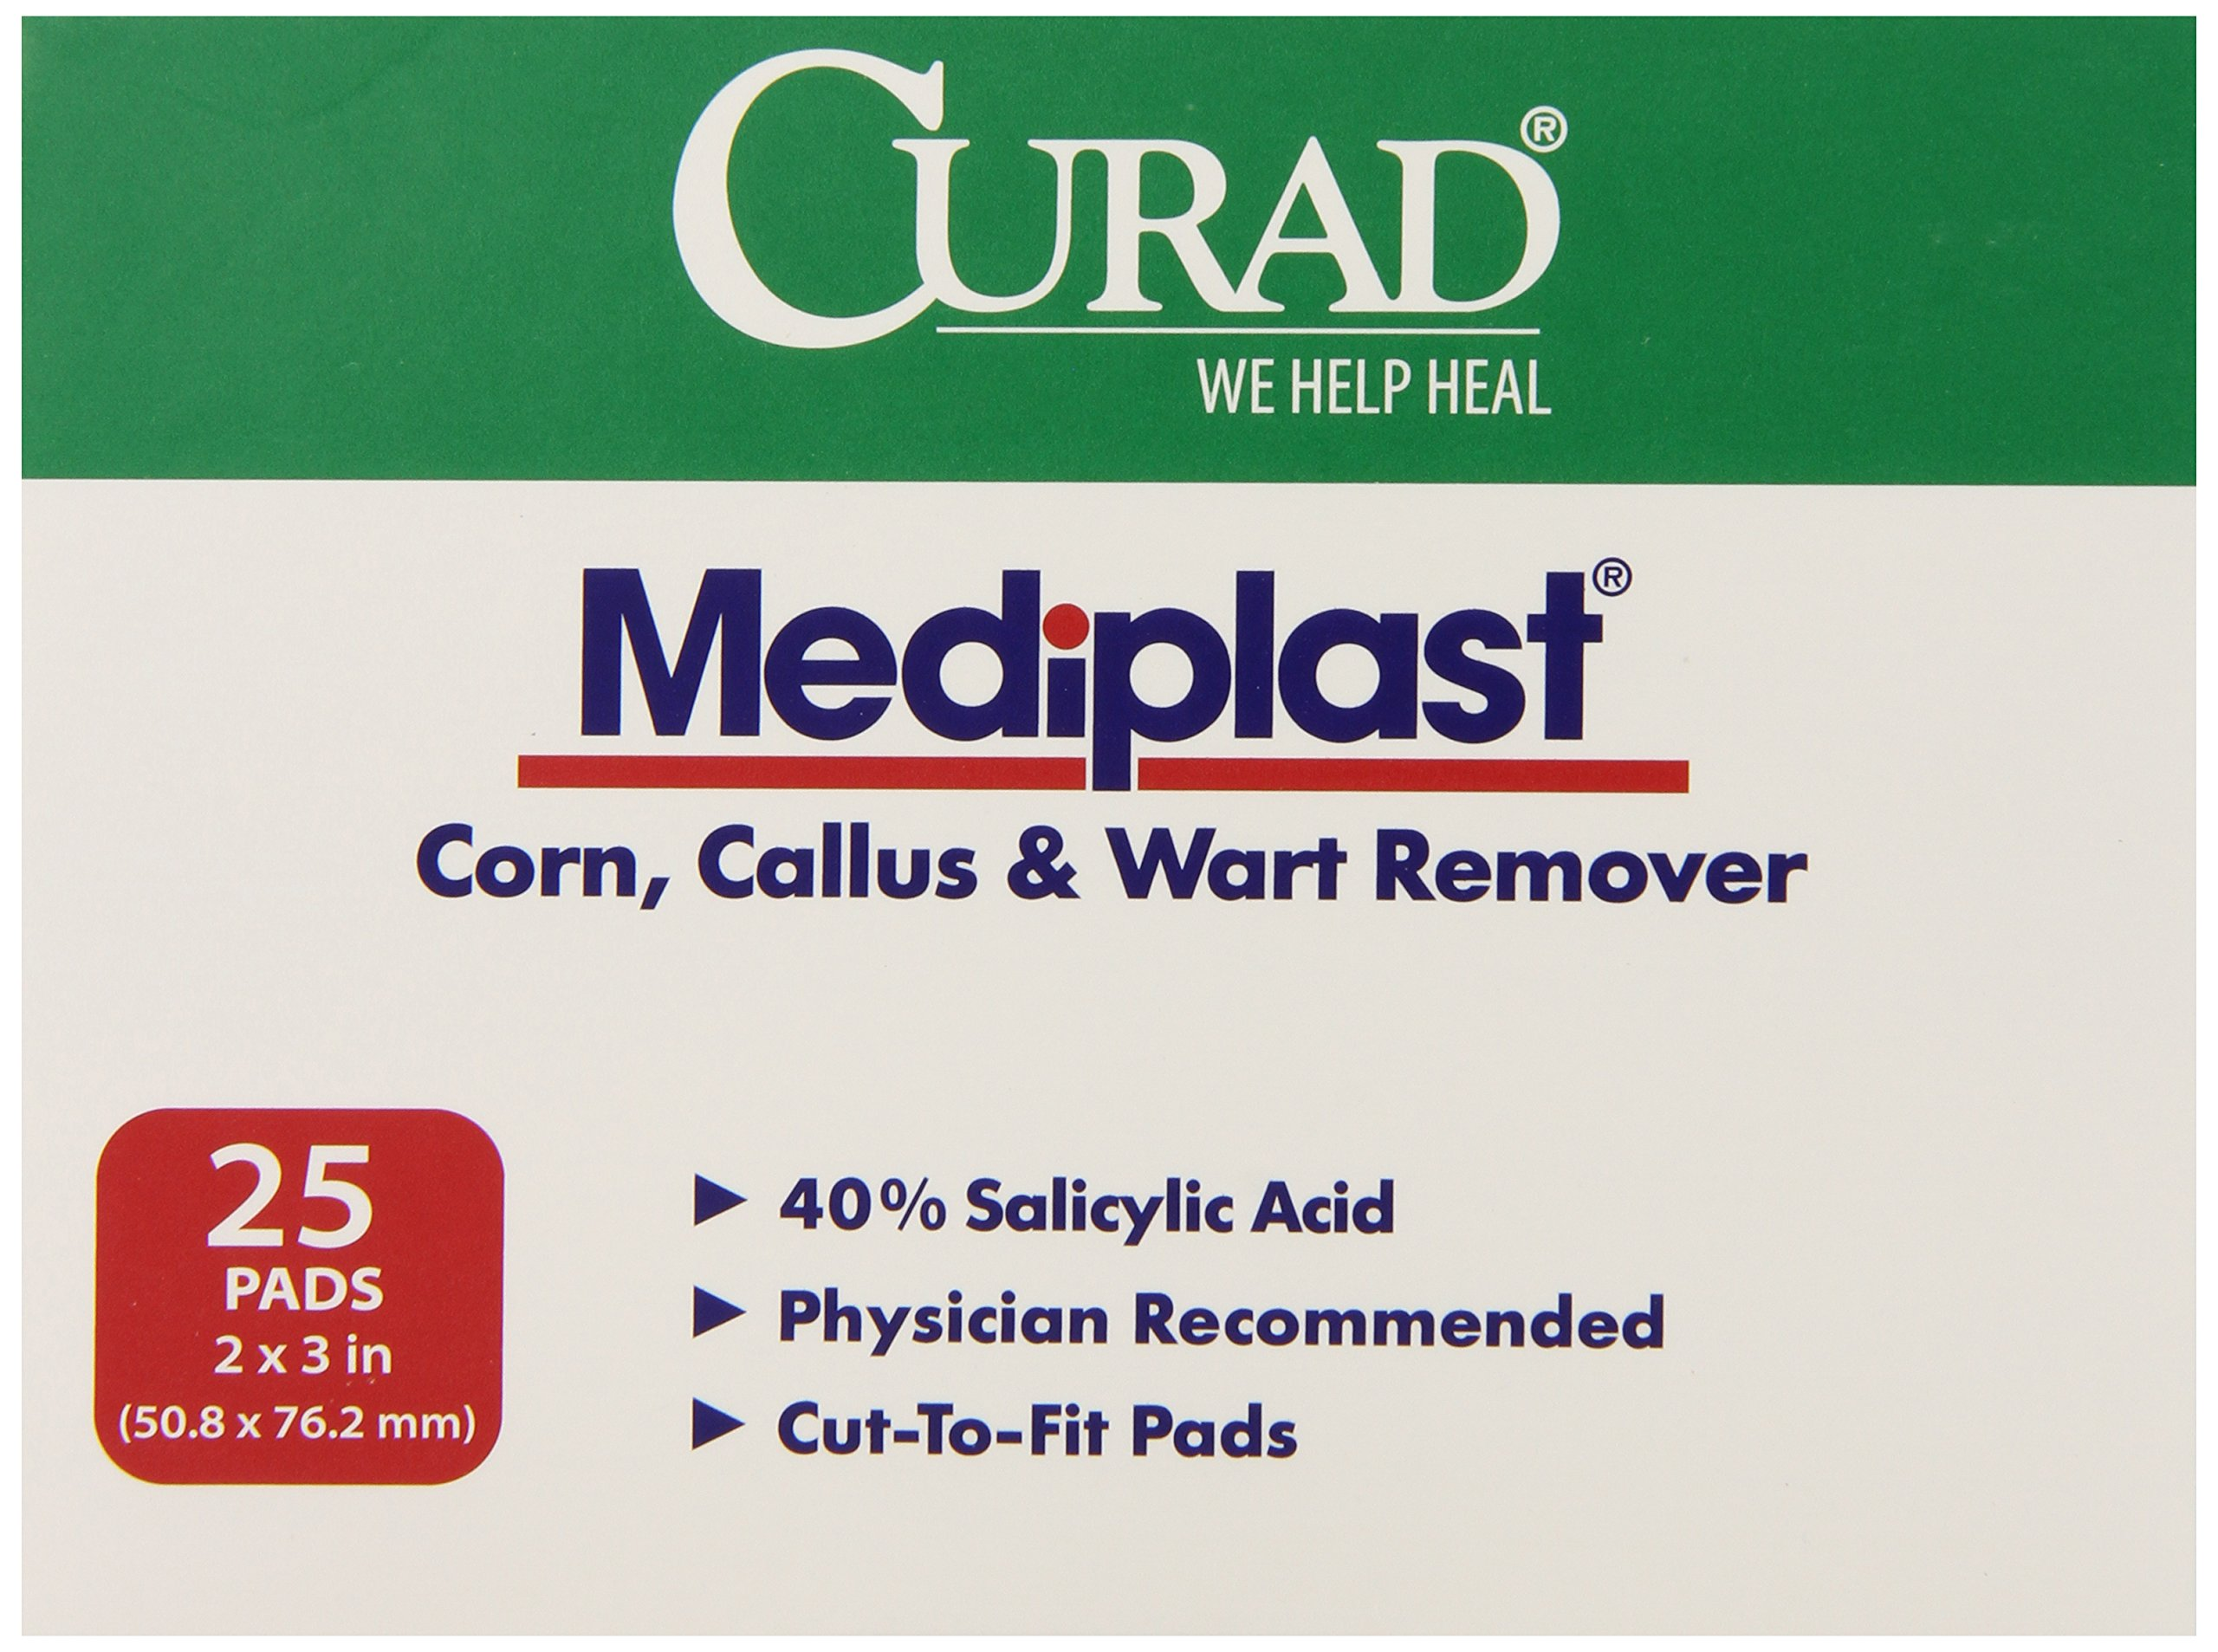 Medline Pad Mediplast Wart Curad 2 Inch x 3 Inch, 150 Count by Medline